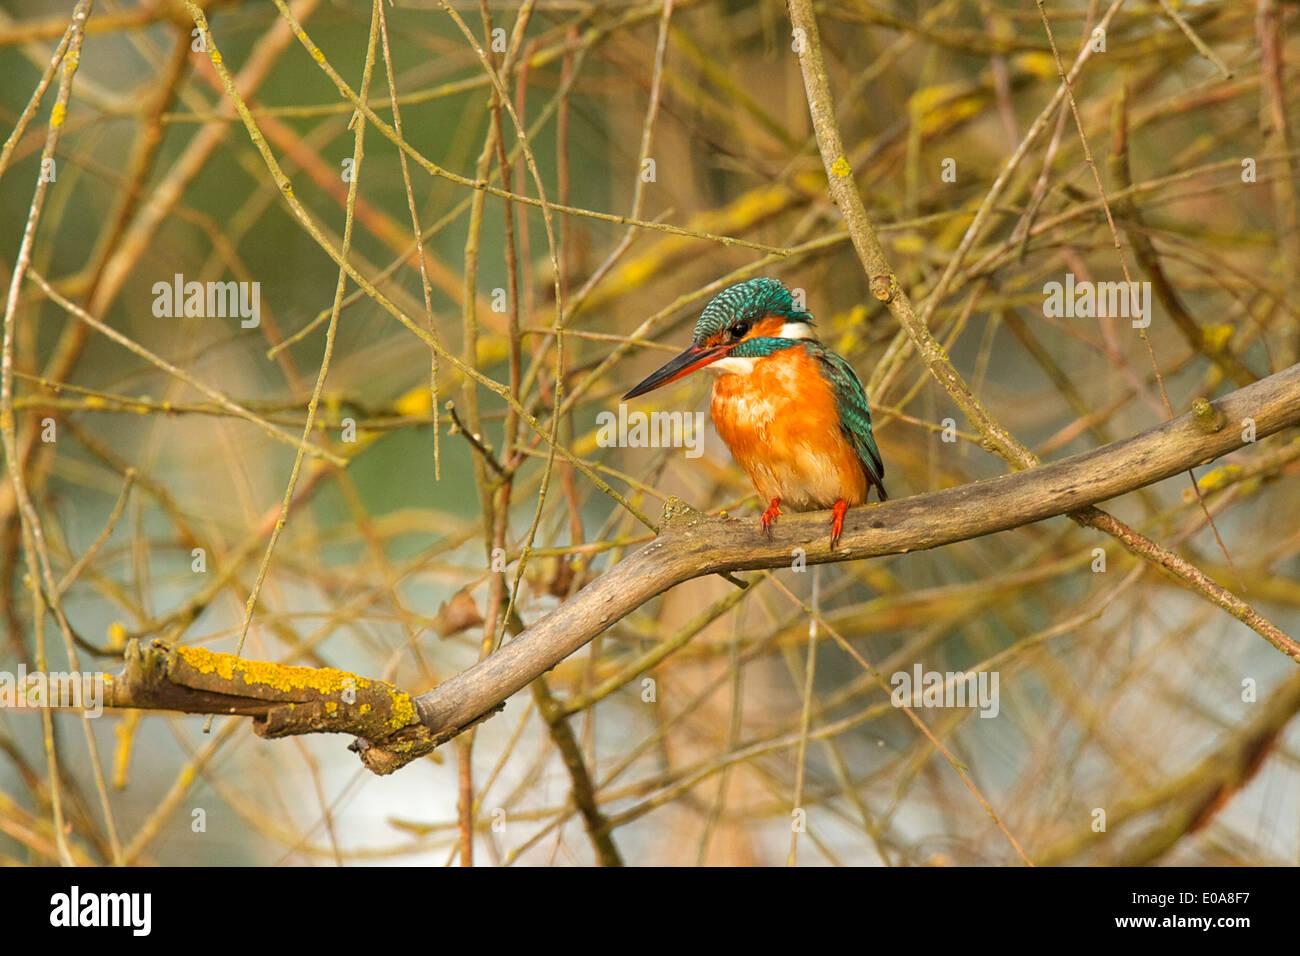 Malachite kingfisher - Alcedo cristata, Selous National Park, Tanzania - Stock Image